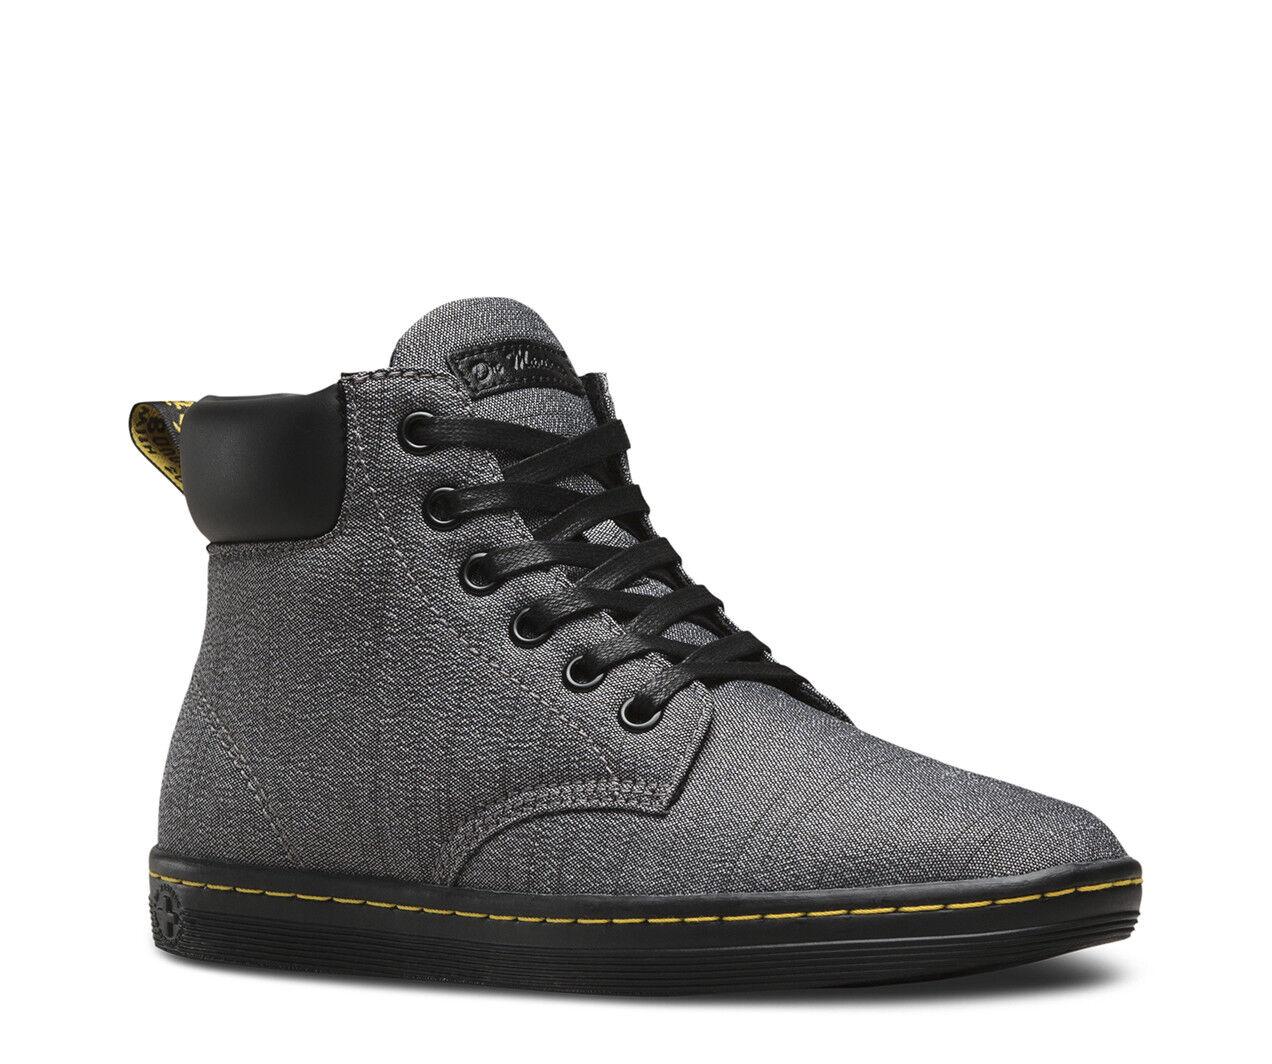 Dr. Martens Wouomo Maelly Mid grigio Canvas 6 Eye High Top scarpe Ankle avvio 5, 11